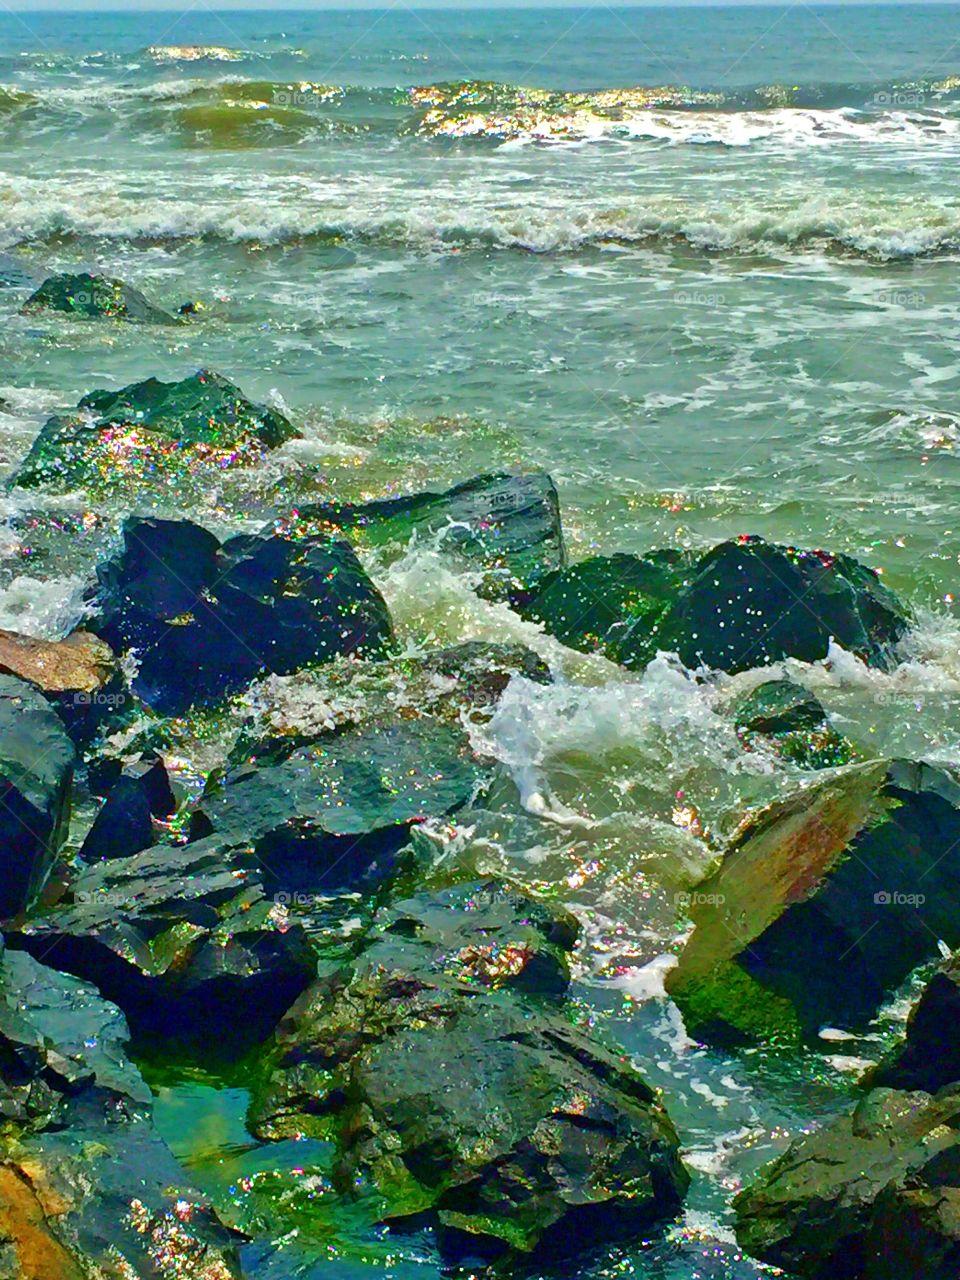 The Oceans Fury